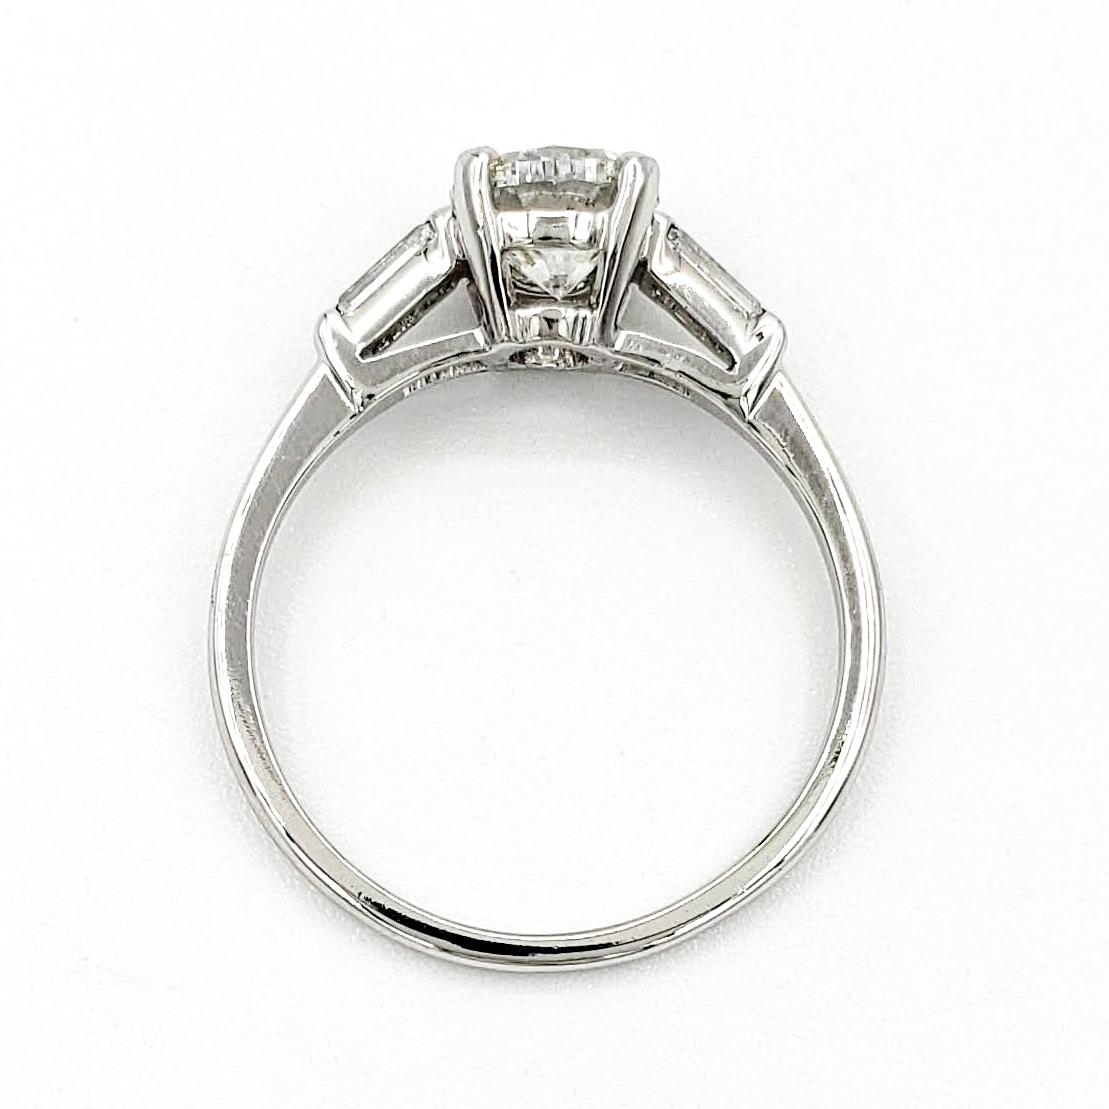 vintage-platinum-engagement-ring-with-0-96-carat-round-brilliant-cut-diamond-egl-g-si2